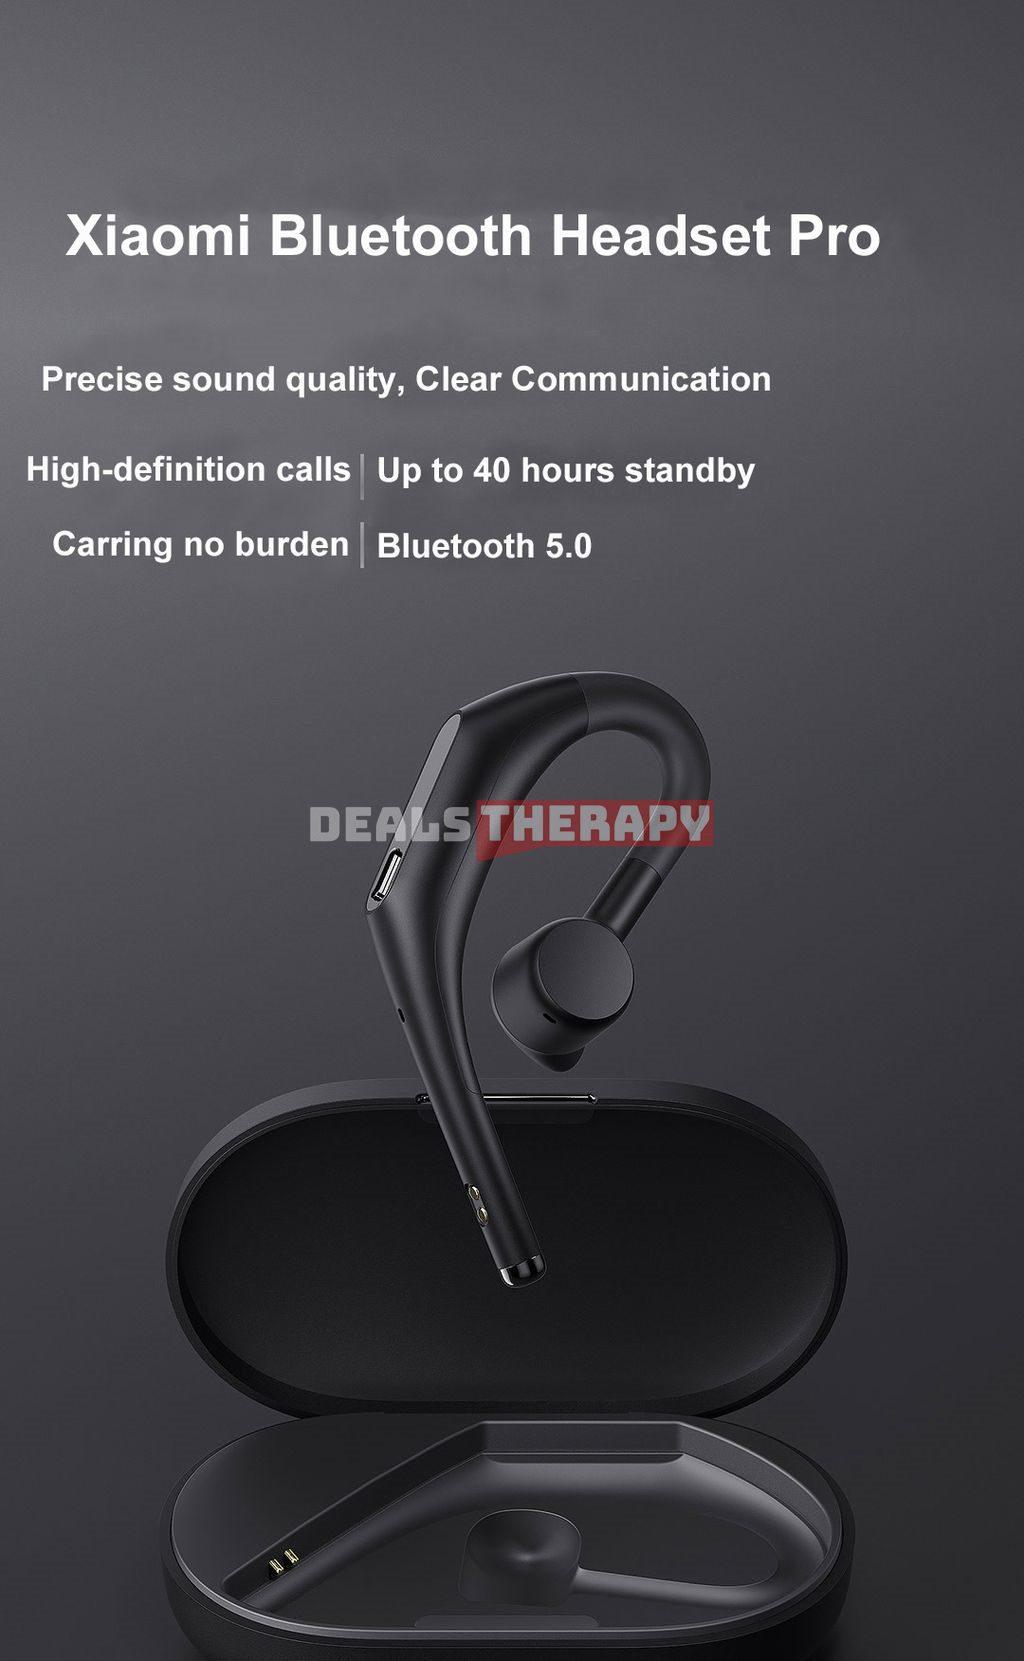 Xiaomi Bluetooth Headset Pro